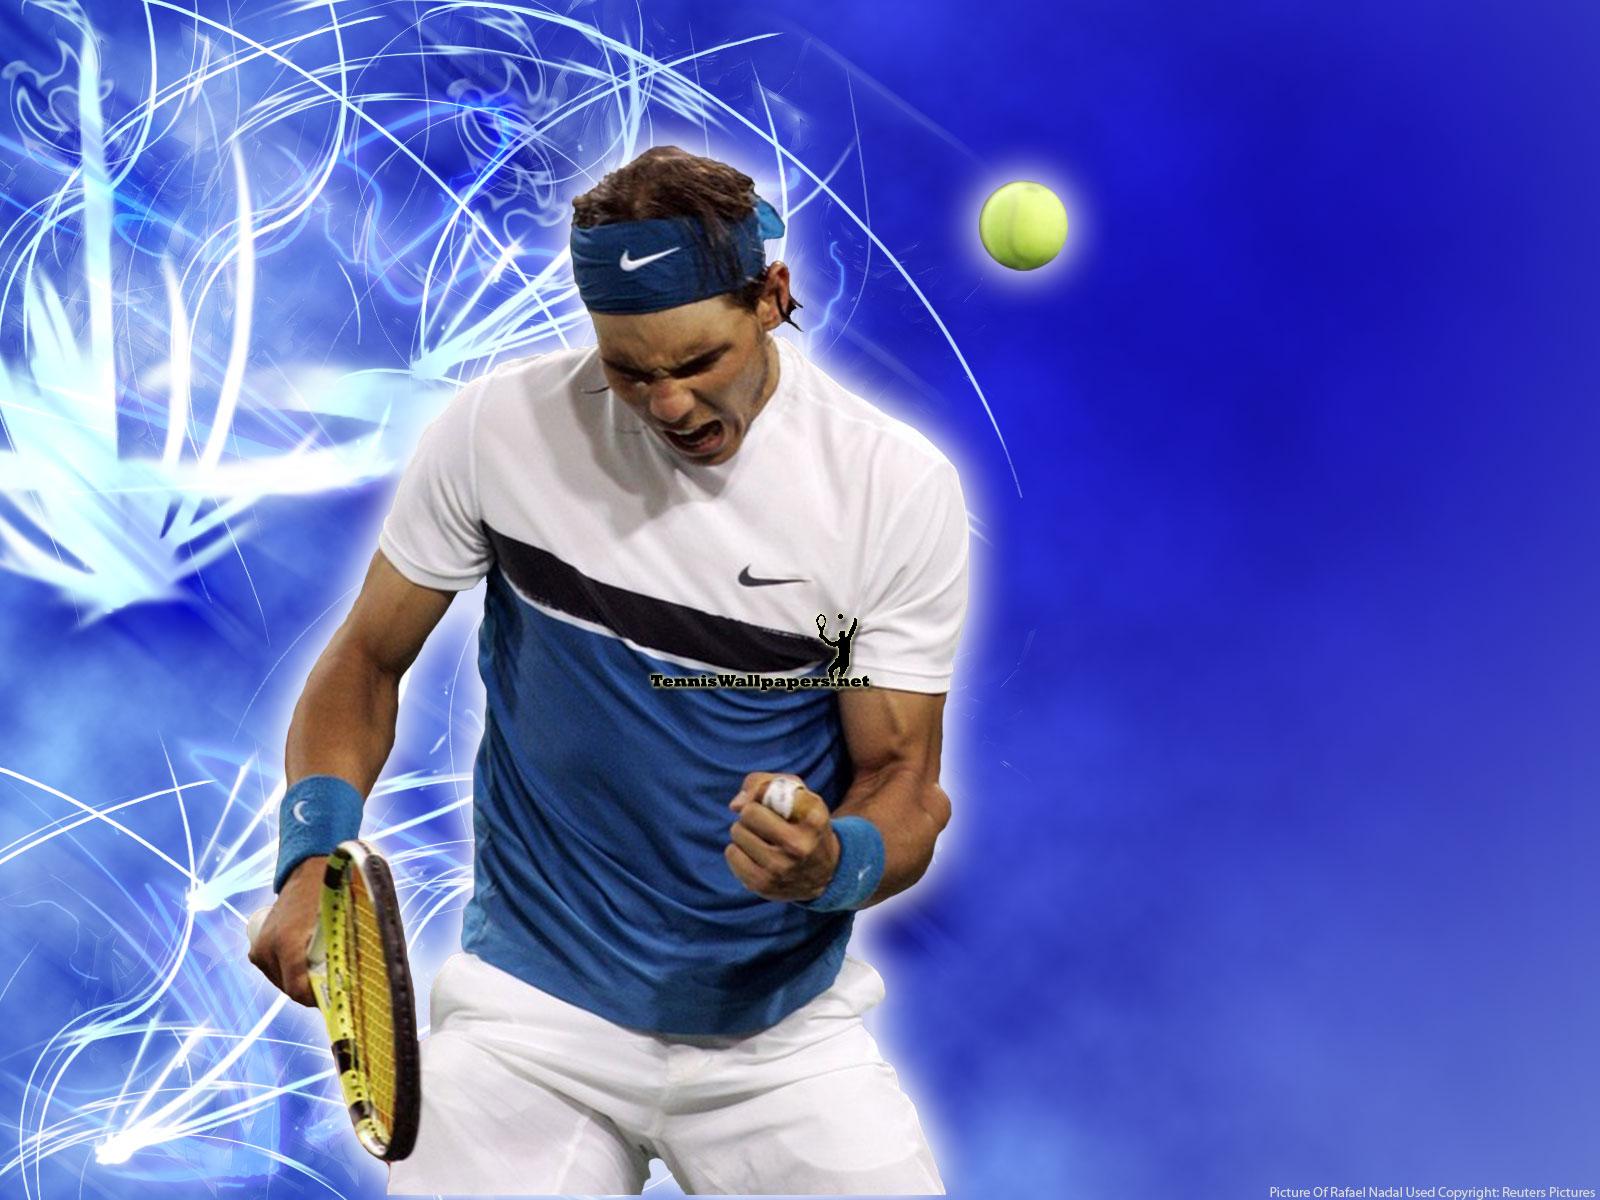 Nadal Hd: Beautiful Cool Wallpapers